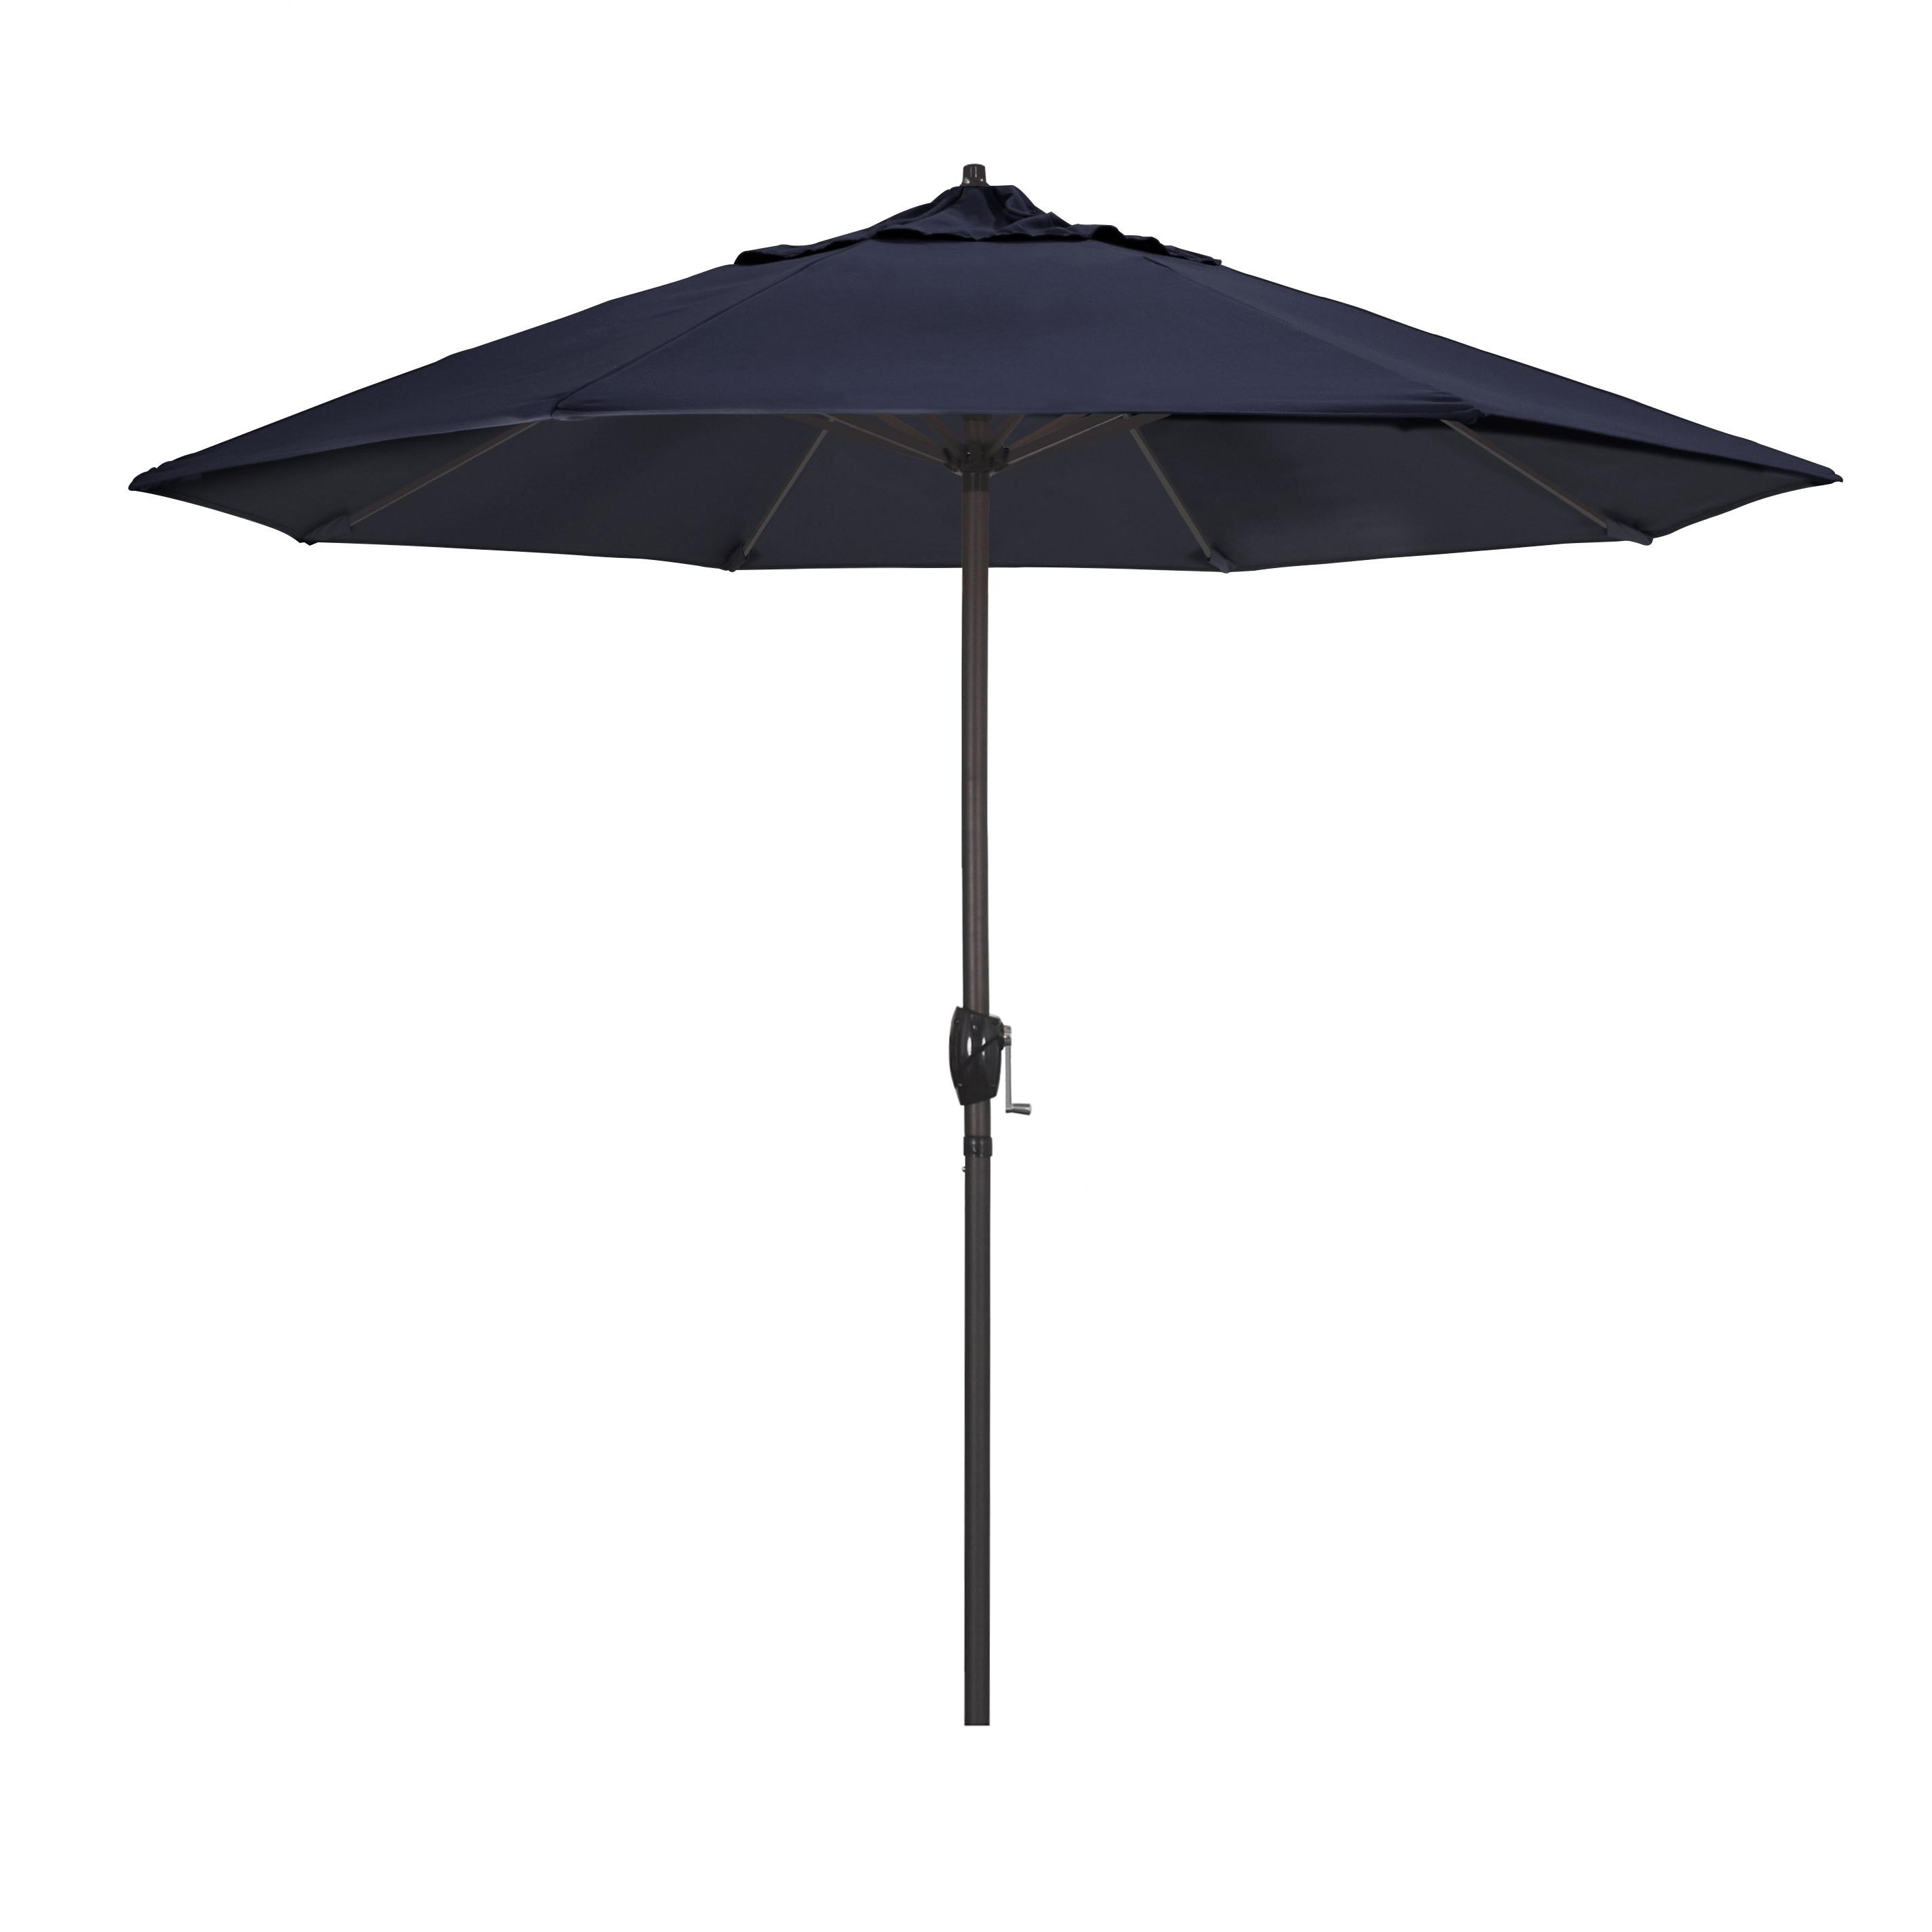 Newest California Umbrella (Gallery 14 of 20)